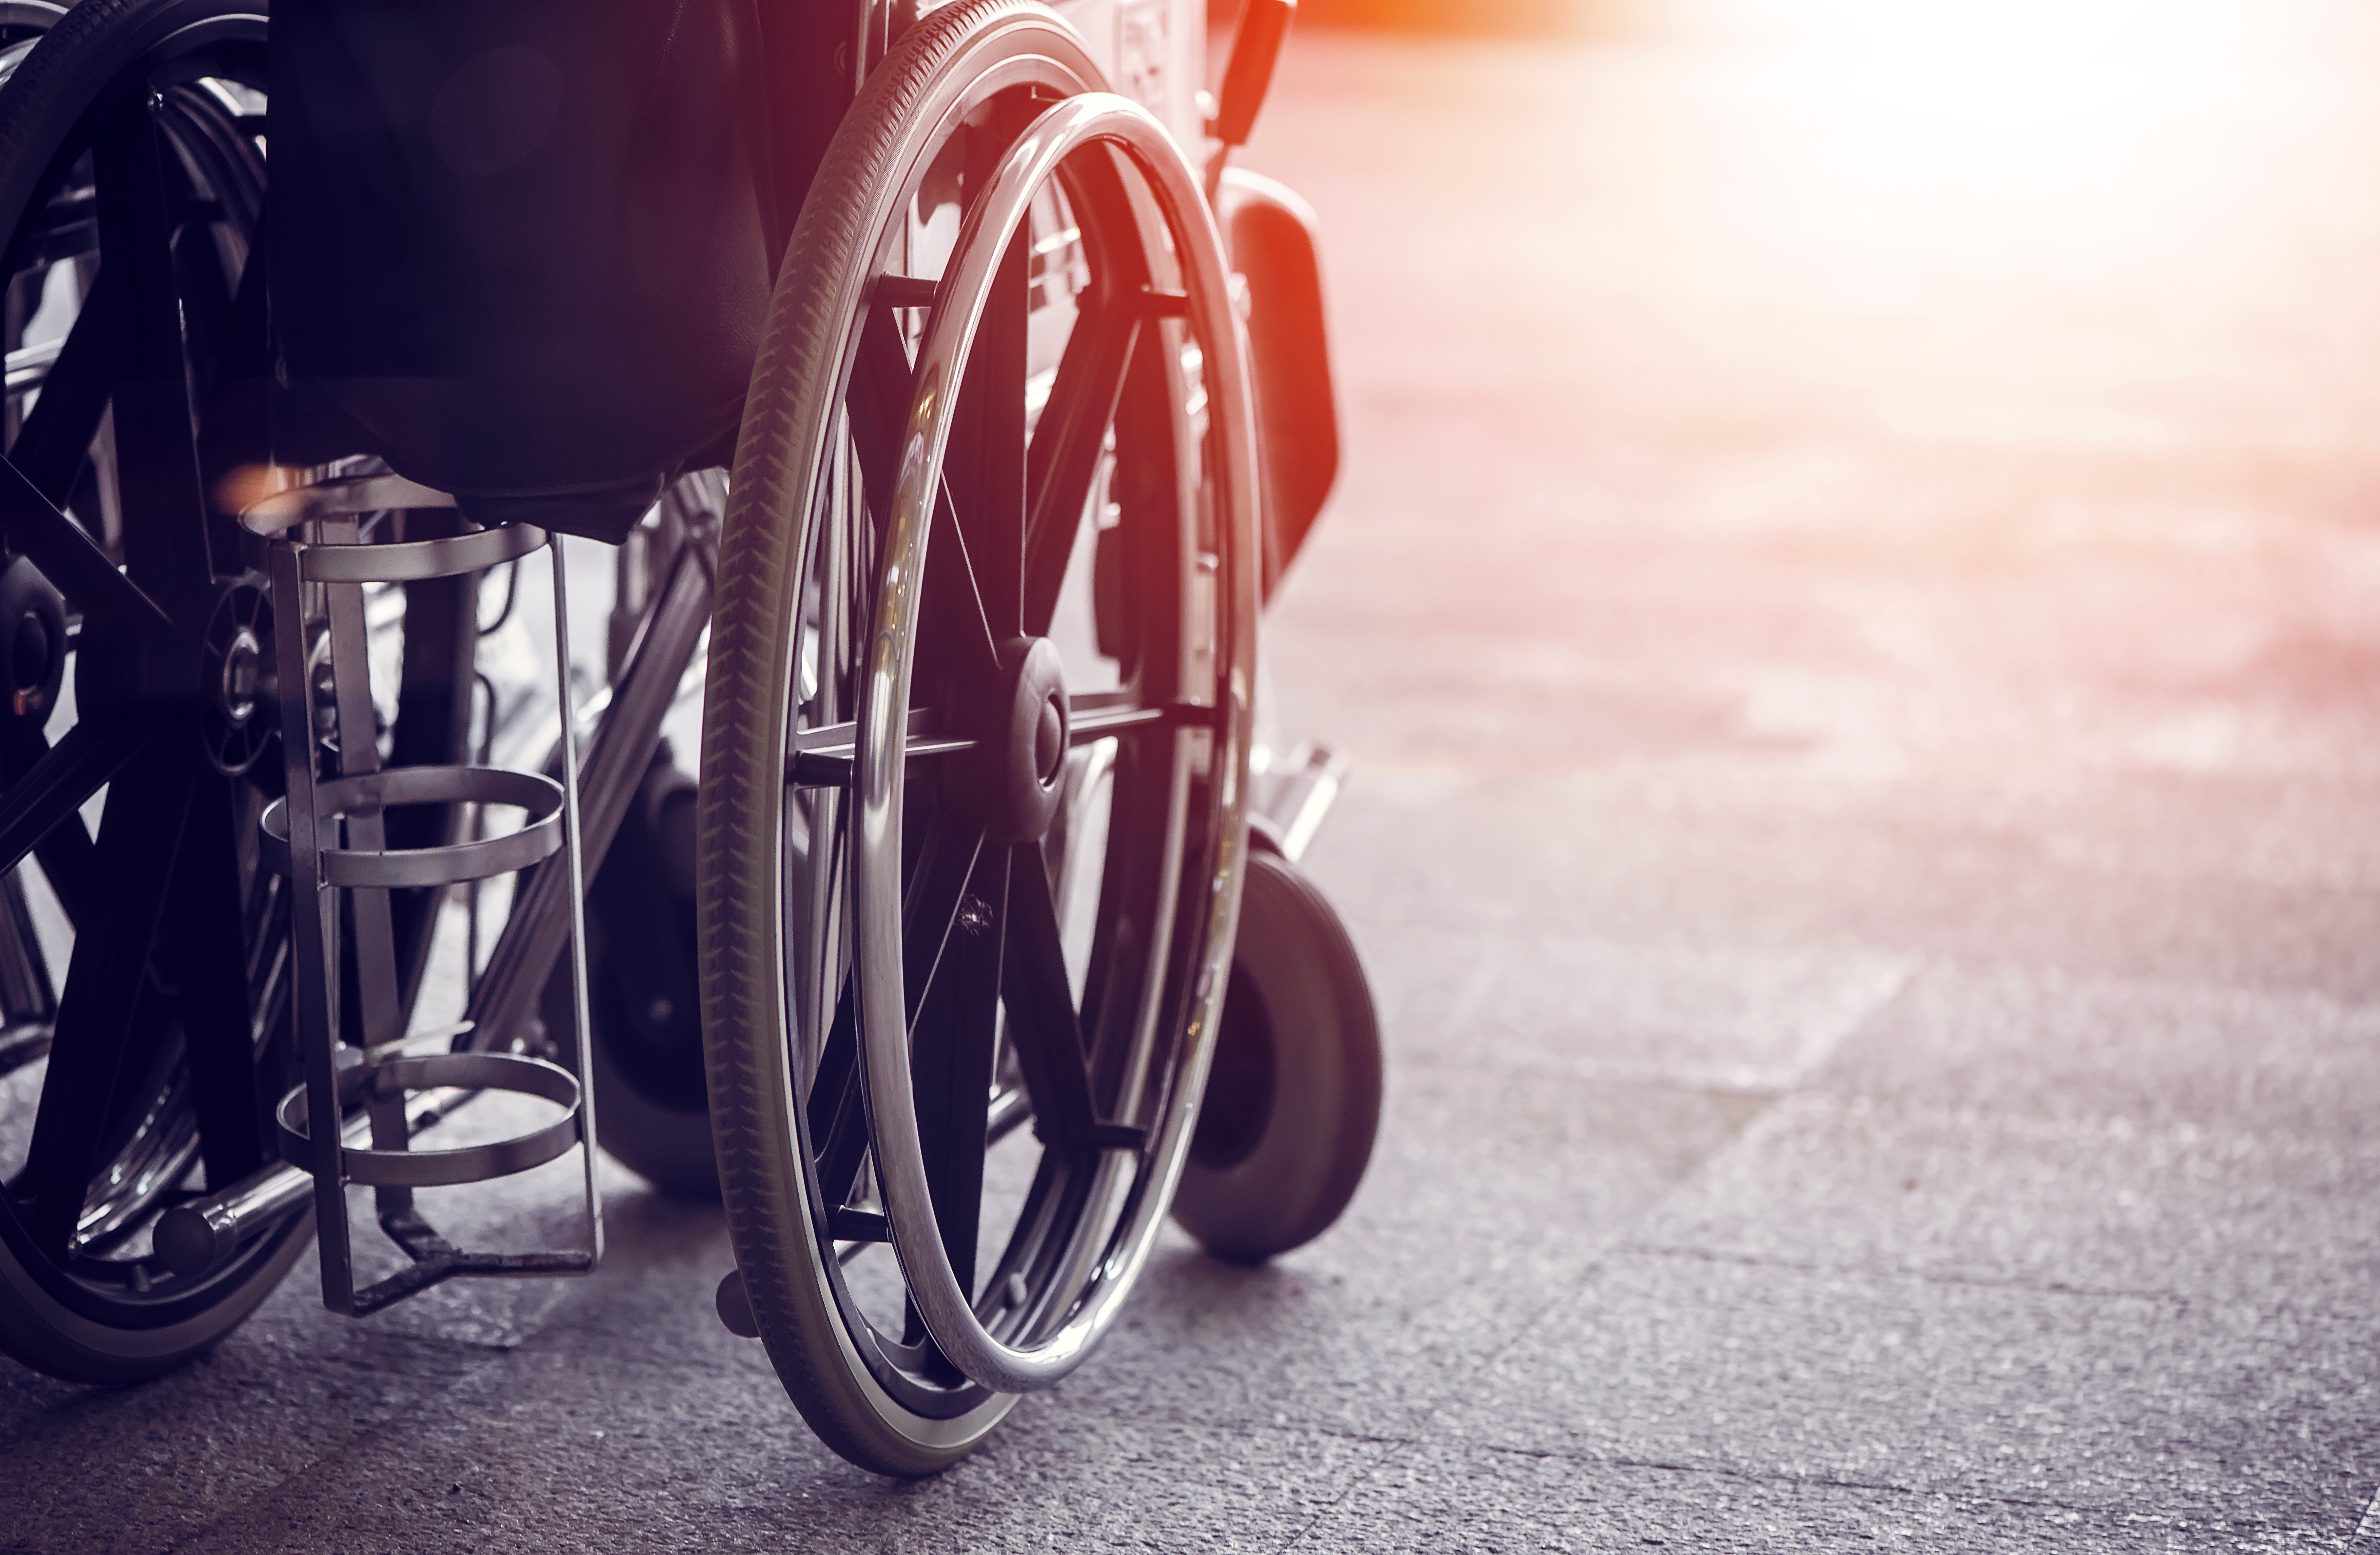 Silla de ruedas. Fuente: Shutterstock